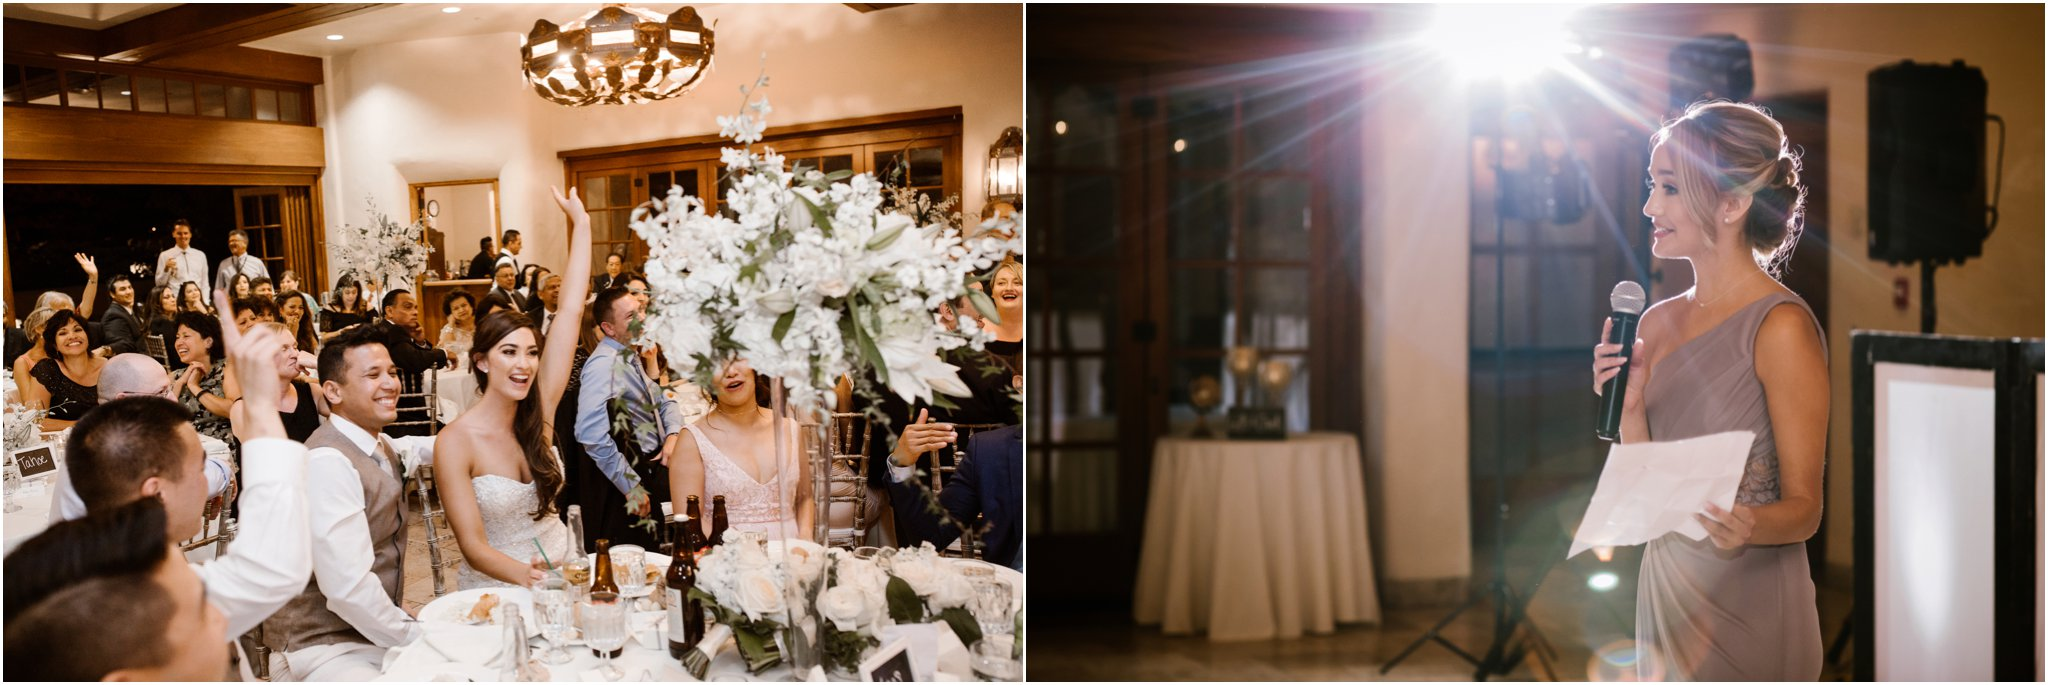 0063La Fonda Weddings Blue Rose Photography Studios